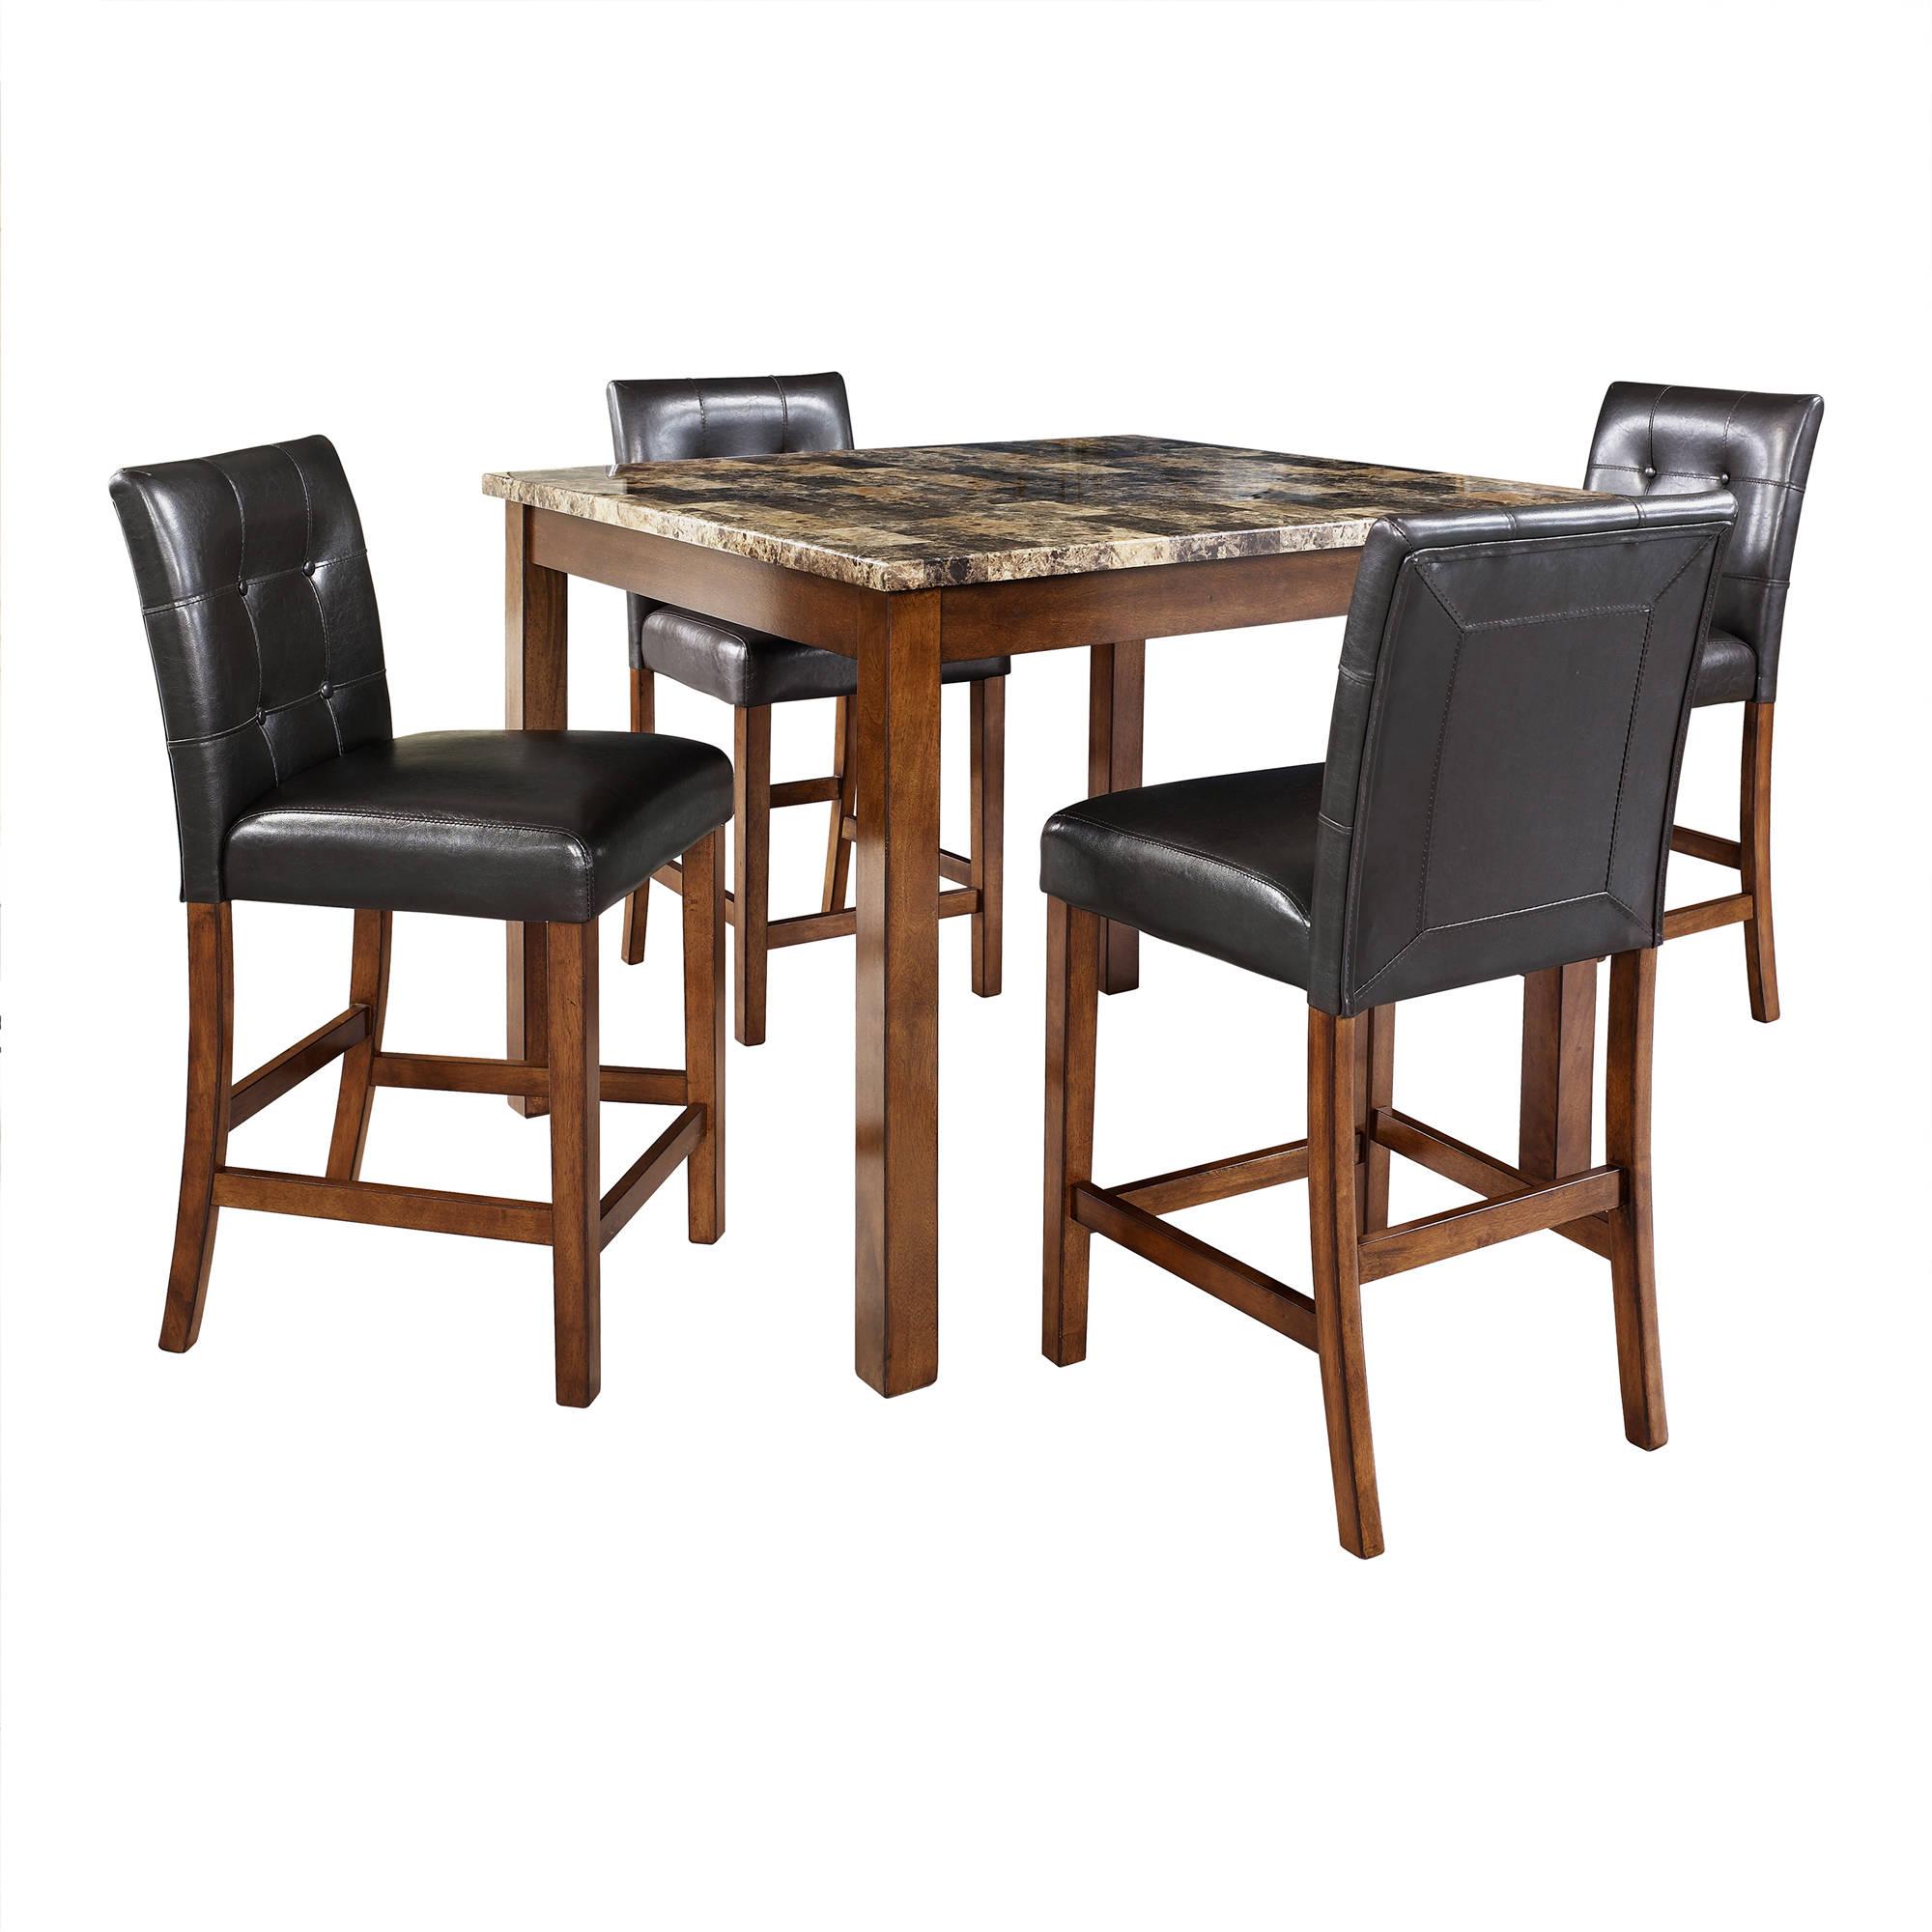 Counter Height Dining Sets - Walmart.com